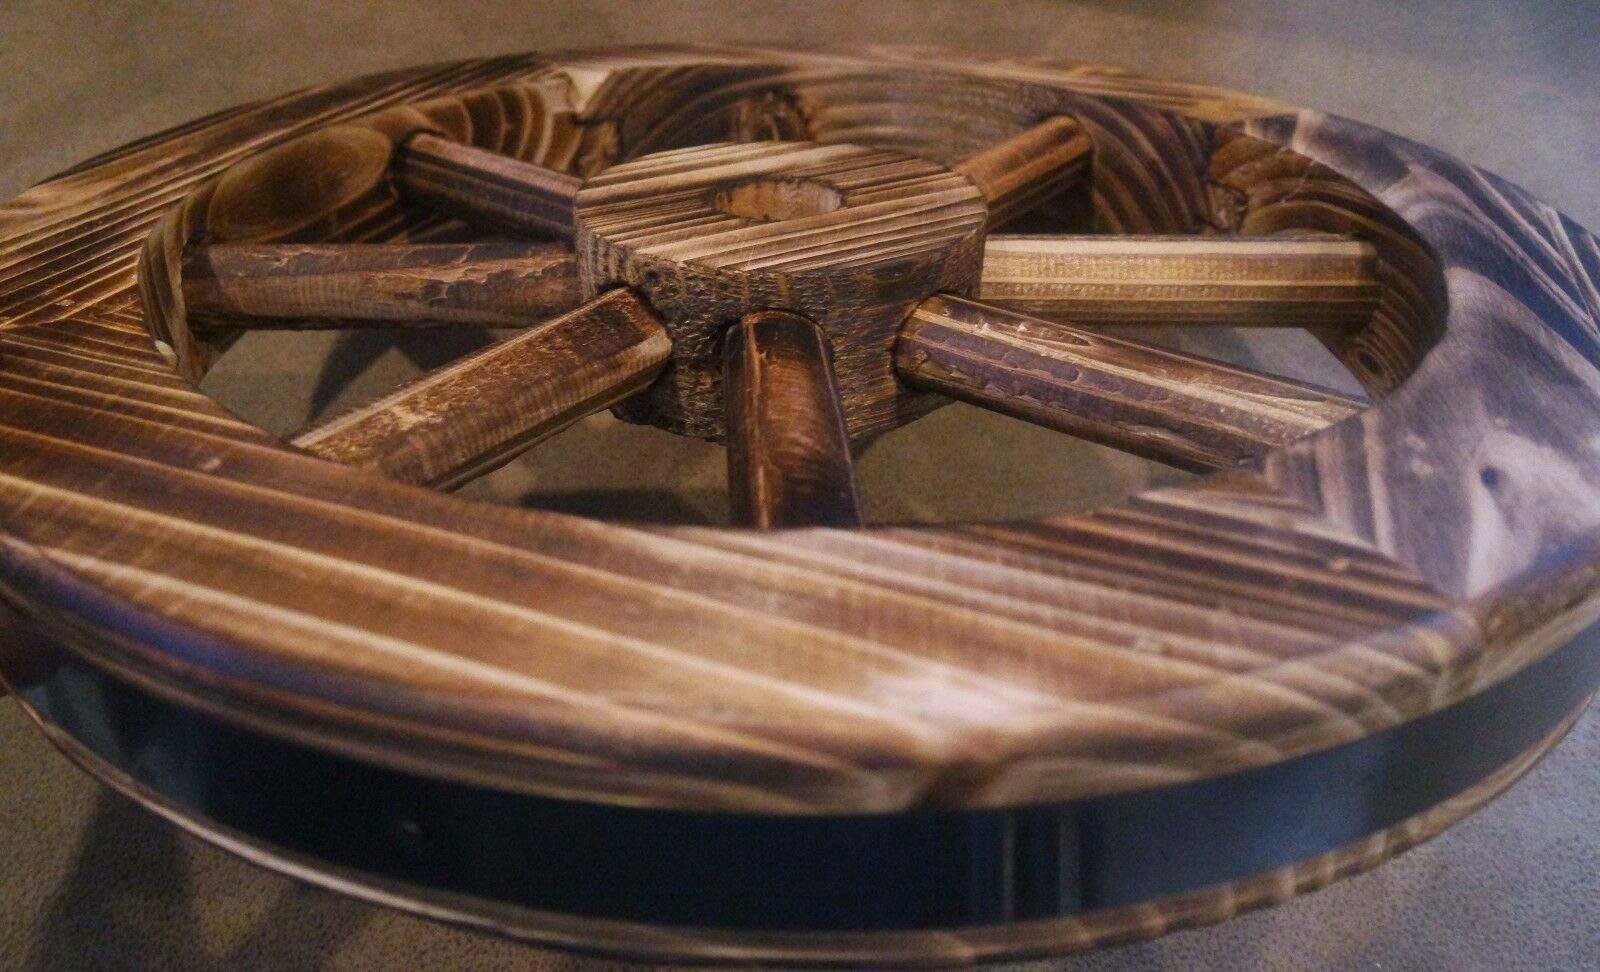 Galapagoz Wooden Wagon Wheels Burnt Wood Wheel Look Garden Decor Table Centerpiece Decorative 12'' 2 Pack US by Galapagoz (Image #5)